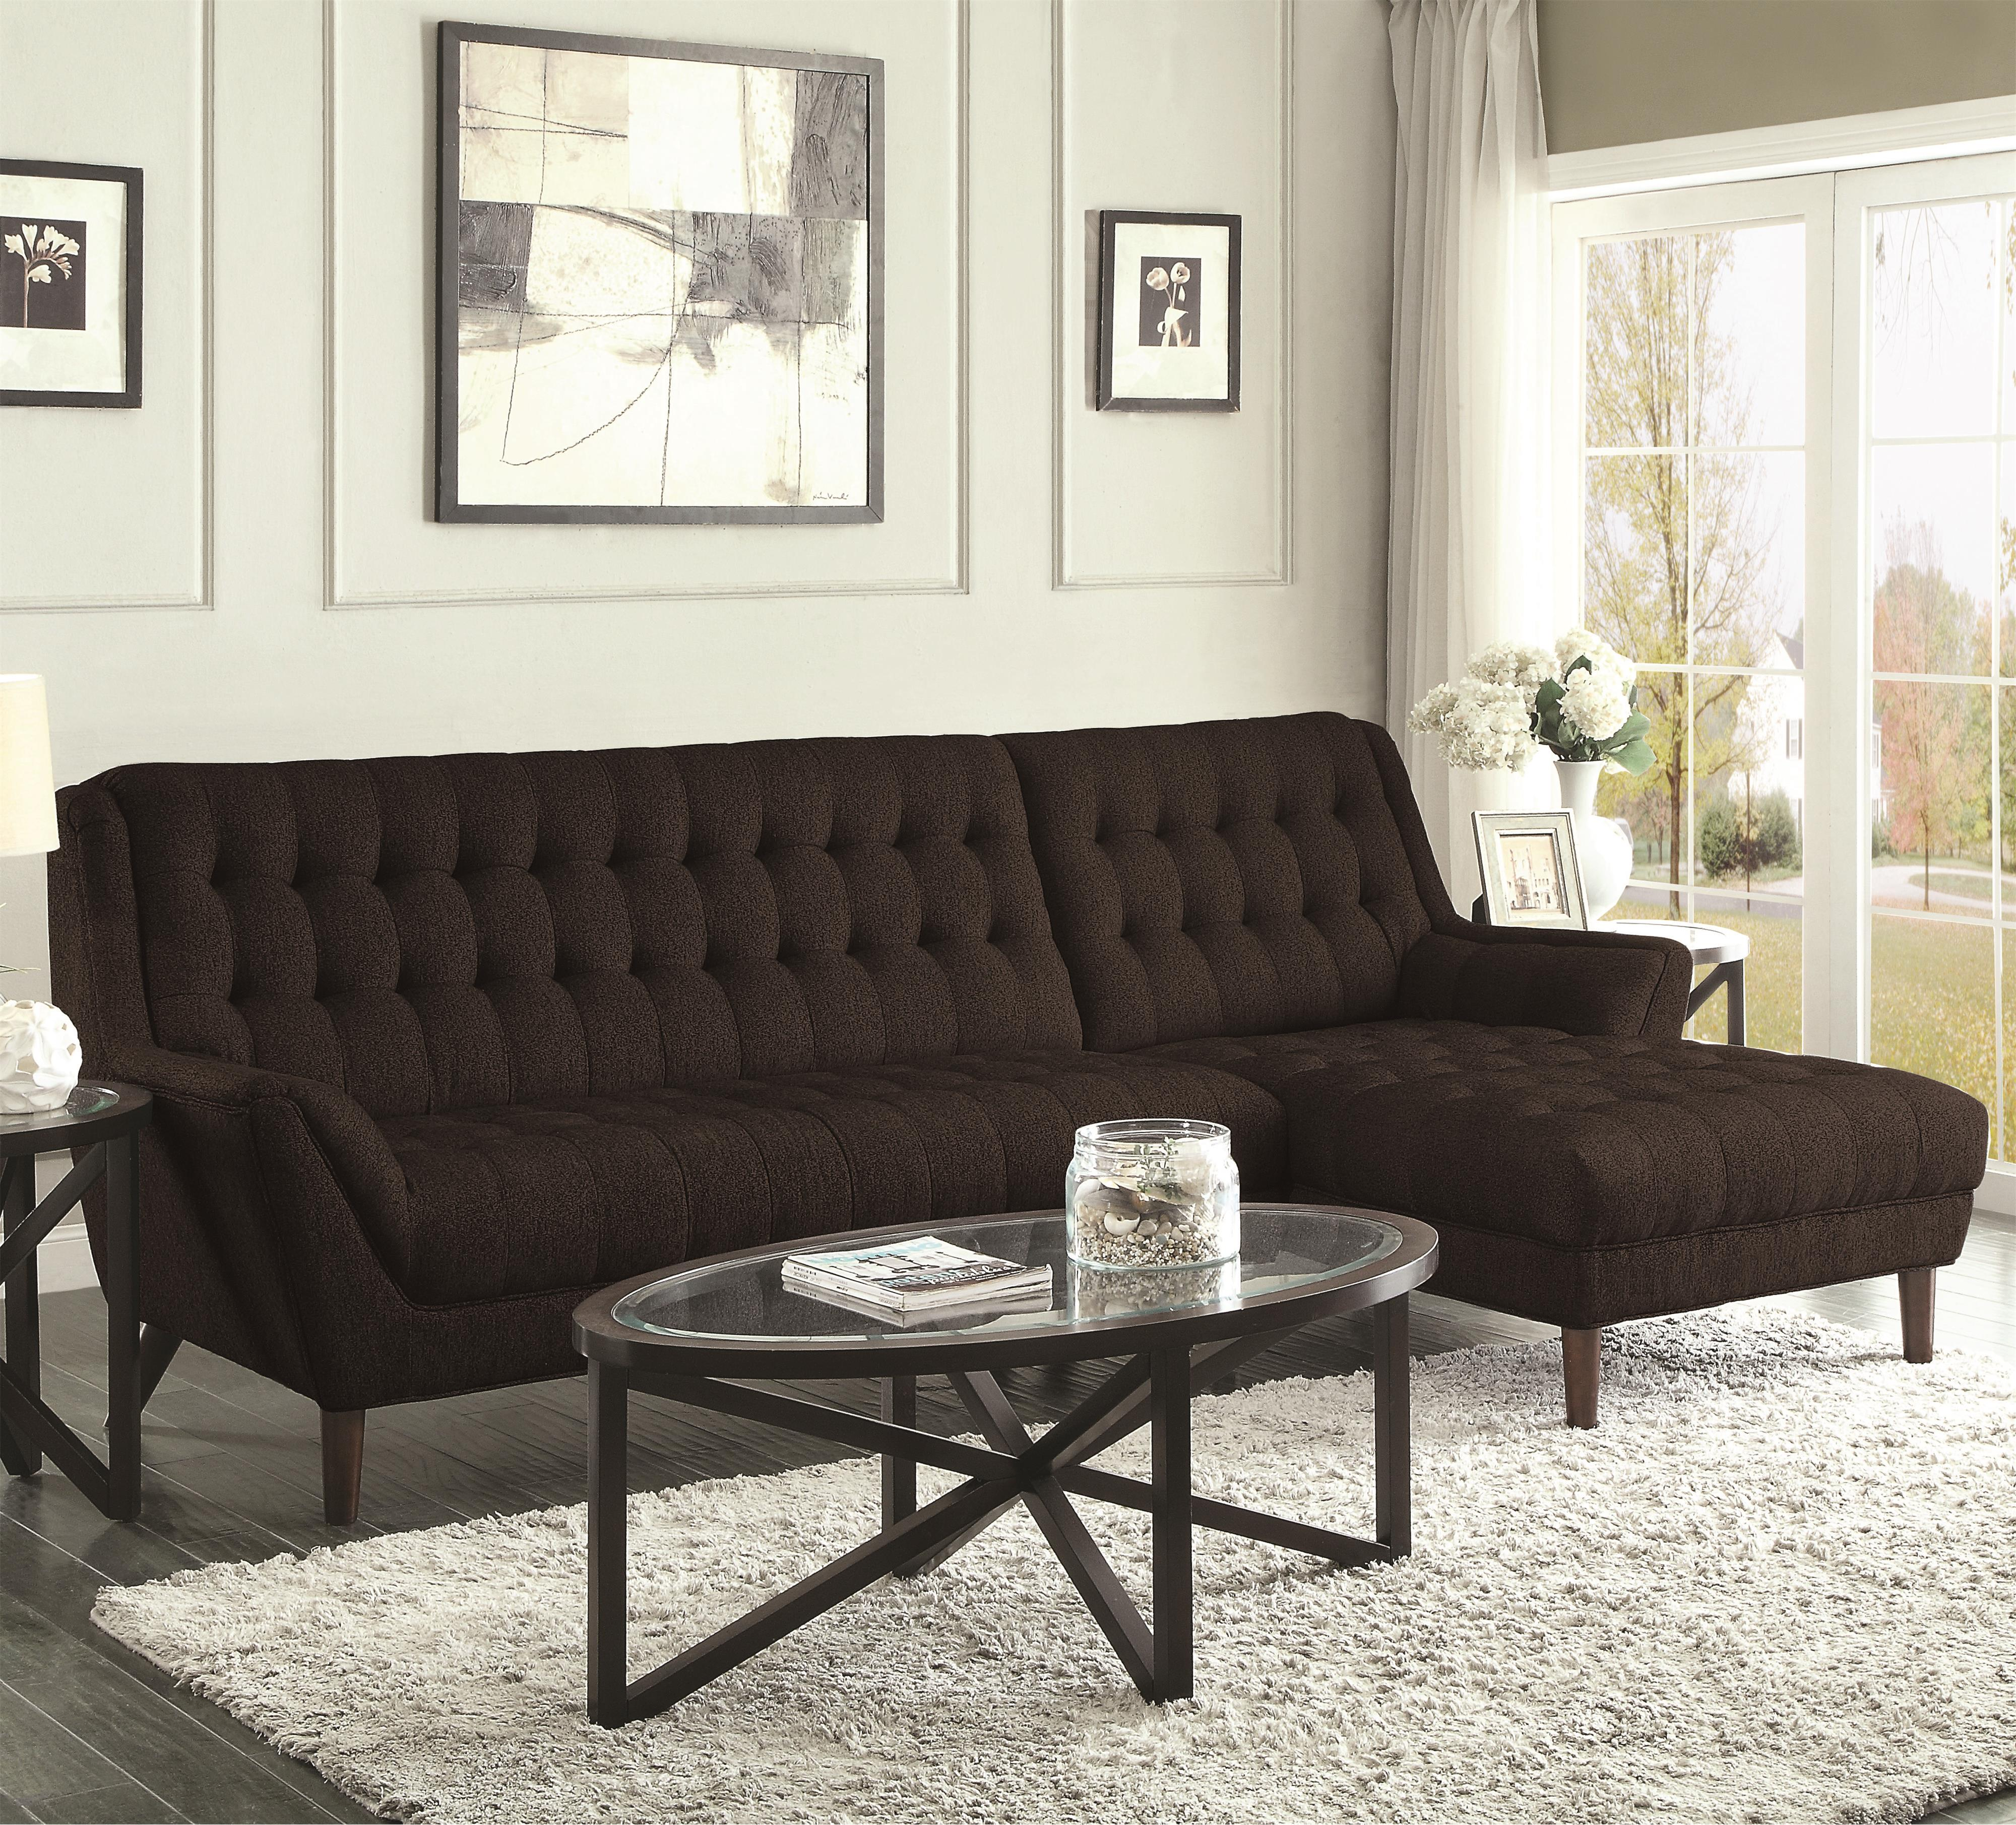 Coaster Natalia Sectional Sofa - Item Number: 503778